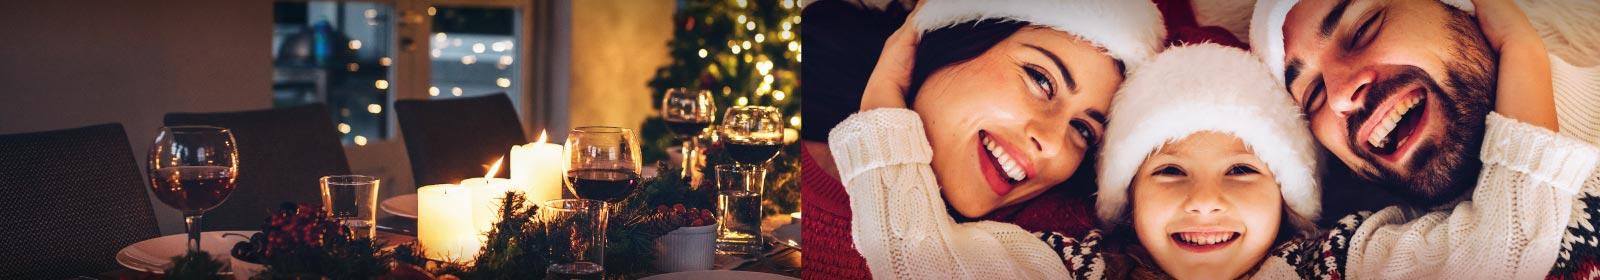 Programa de Natal